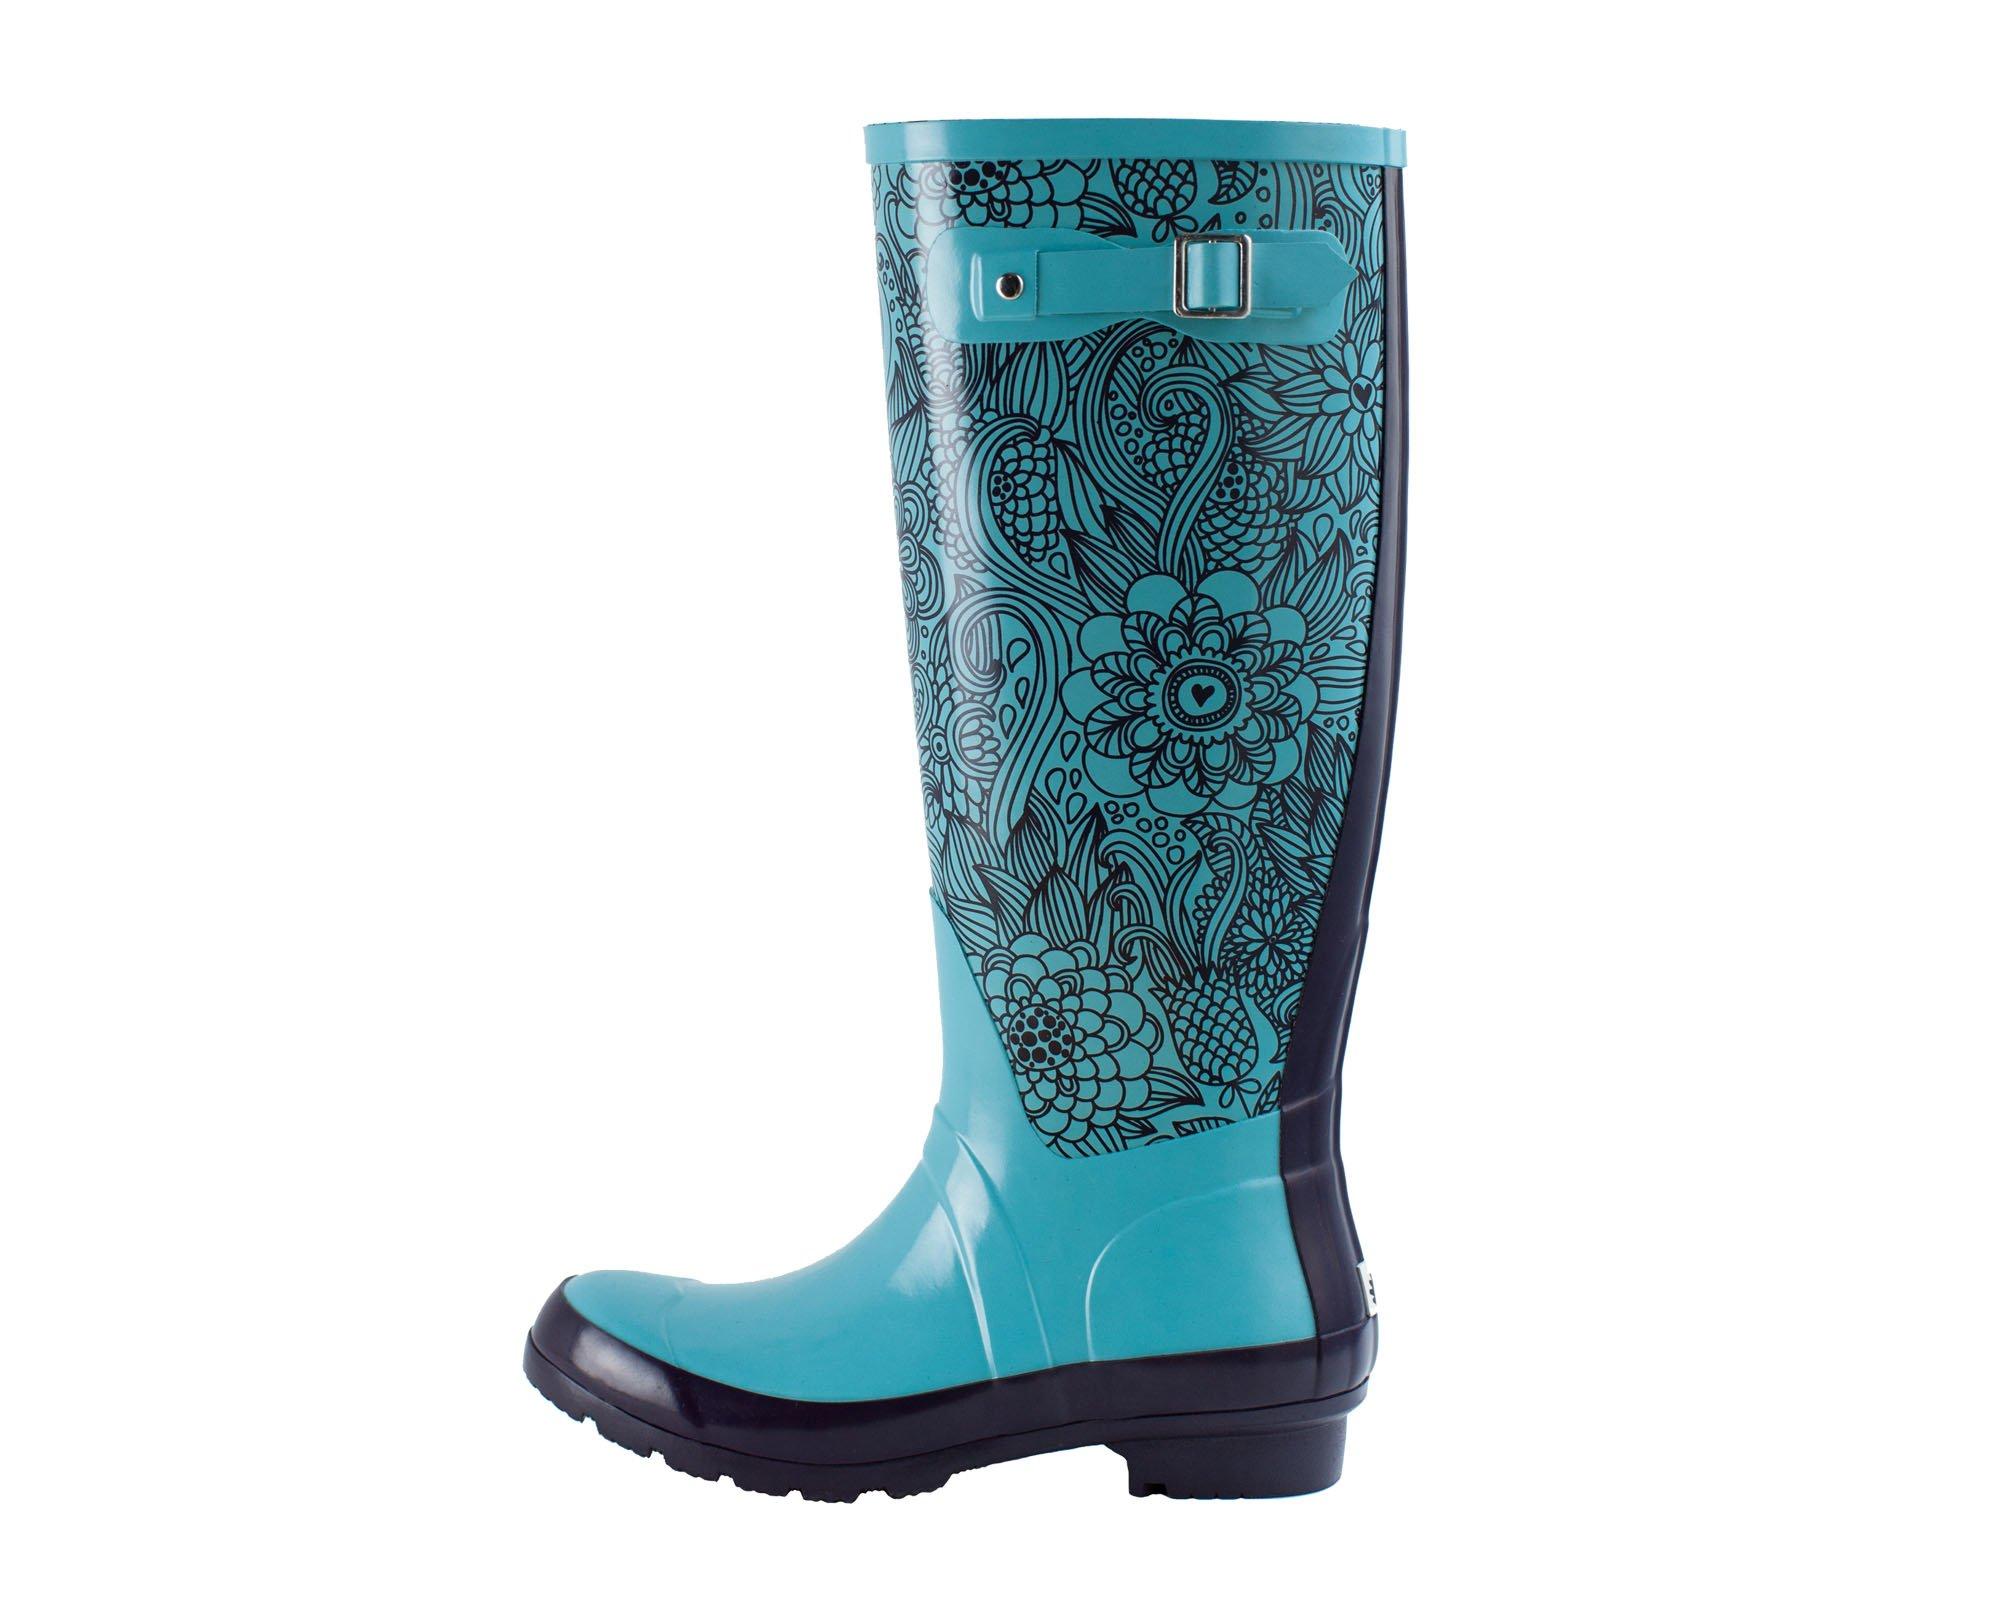 Oakiwear Women's Noxon Rubber Rain Boots, Blue Floral, 10